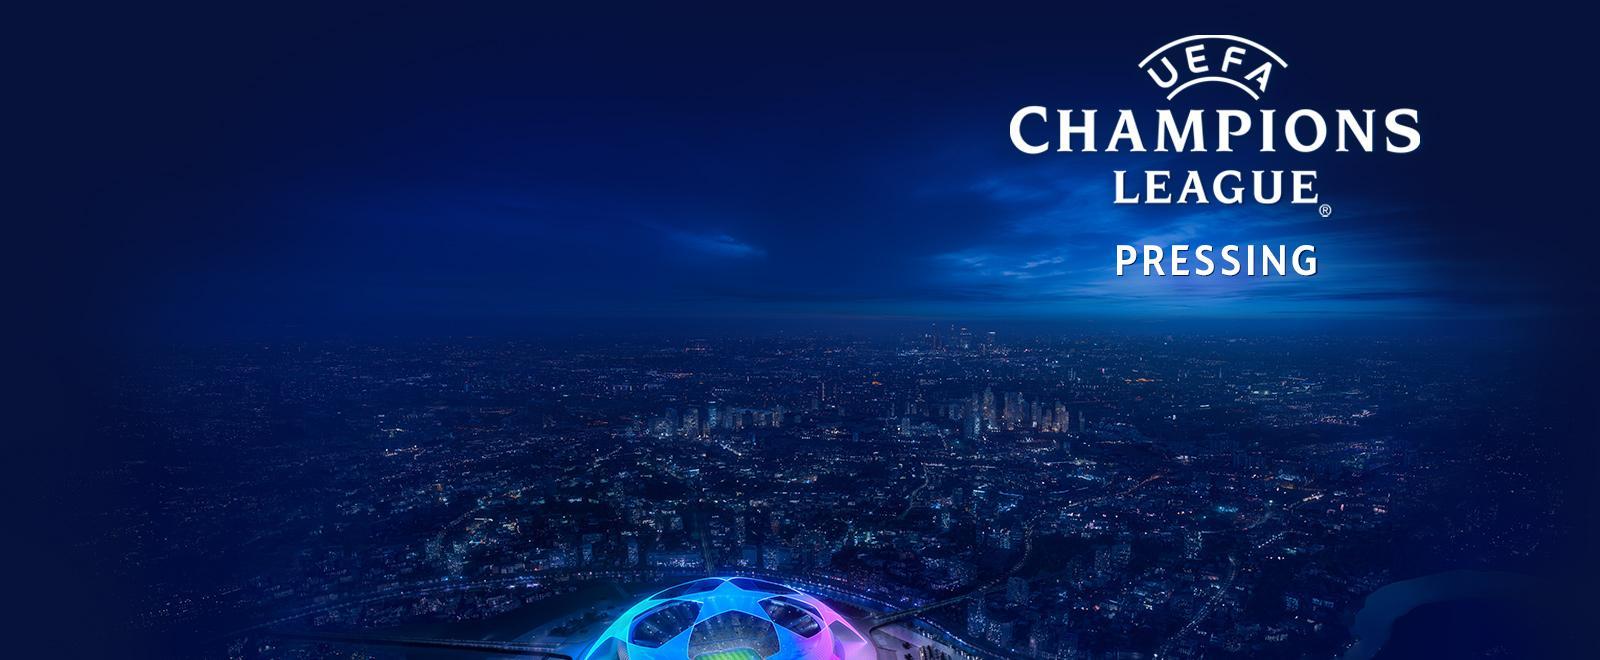 Pressing champions league - 20